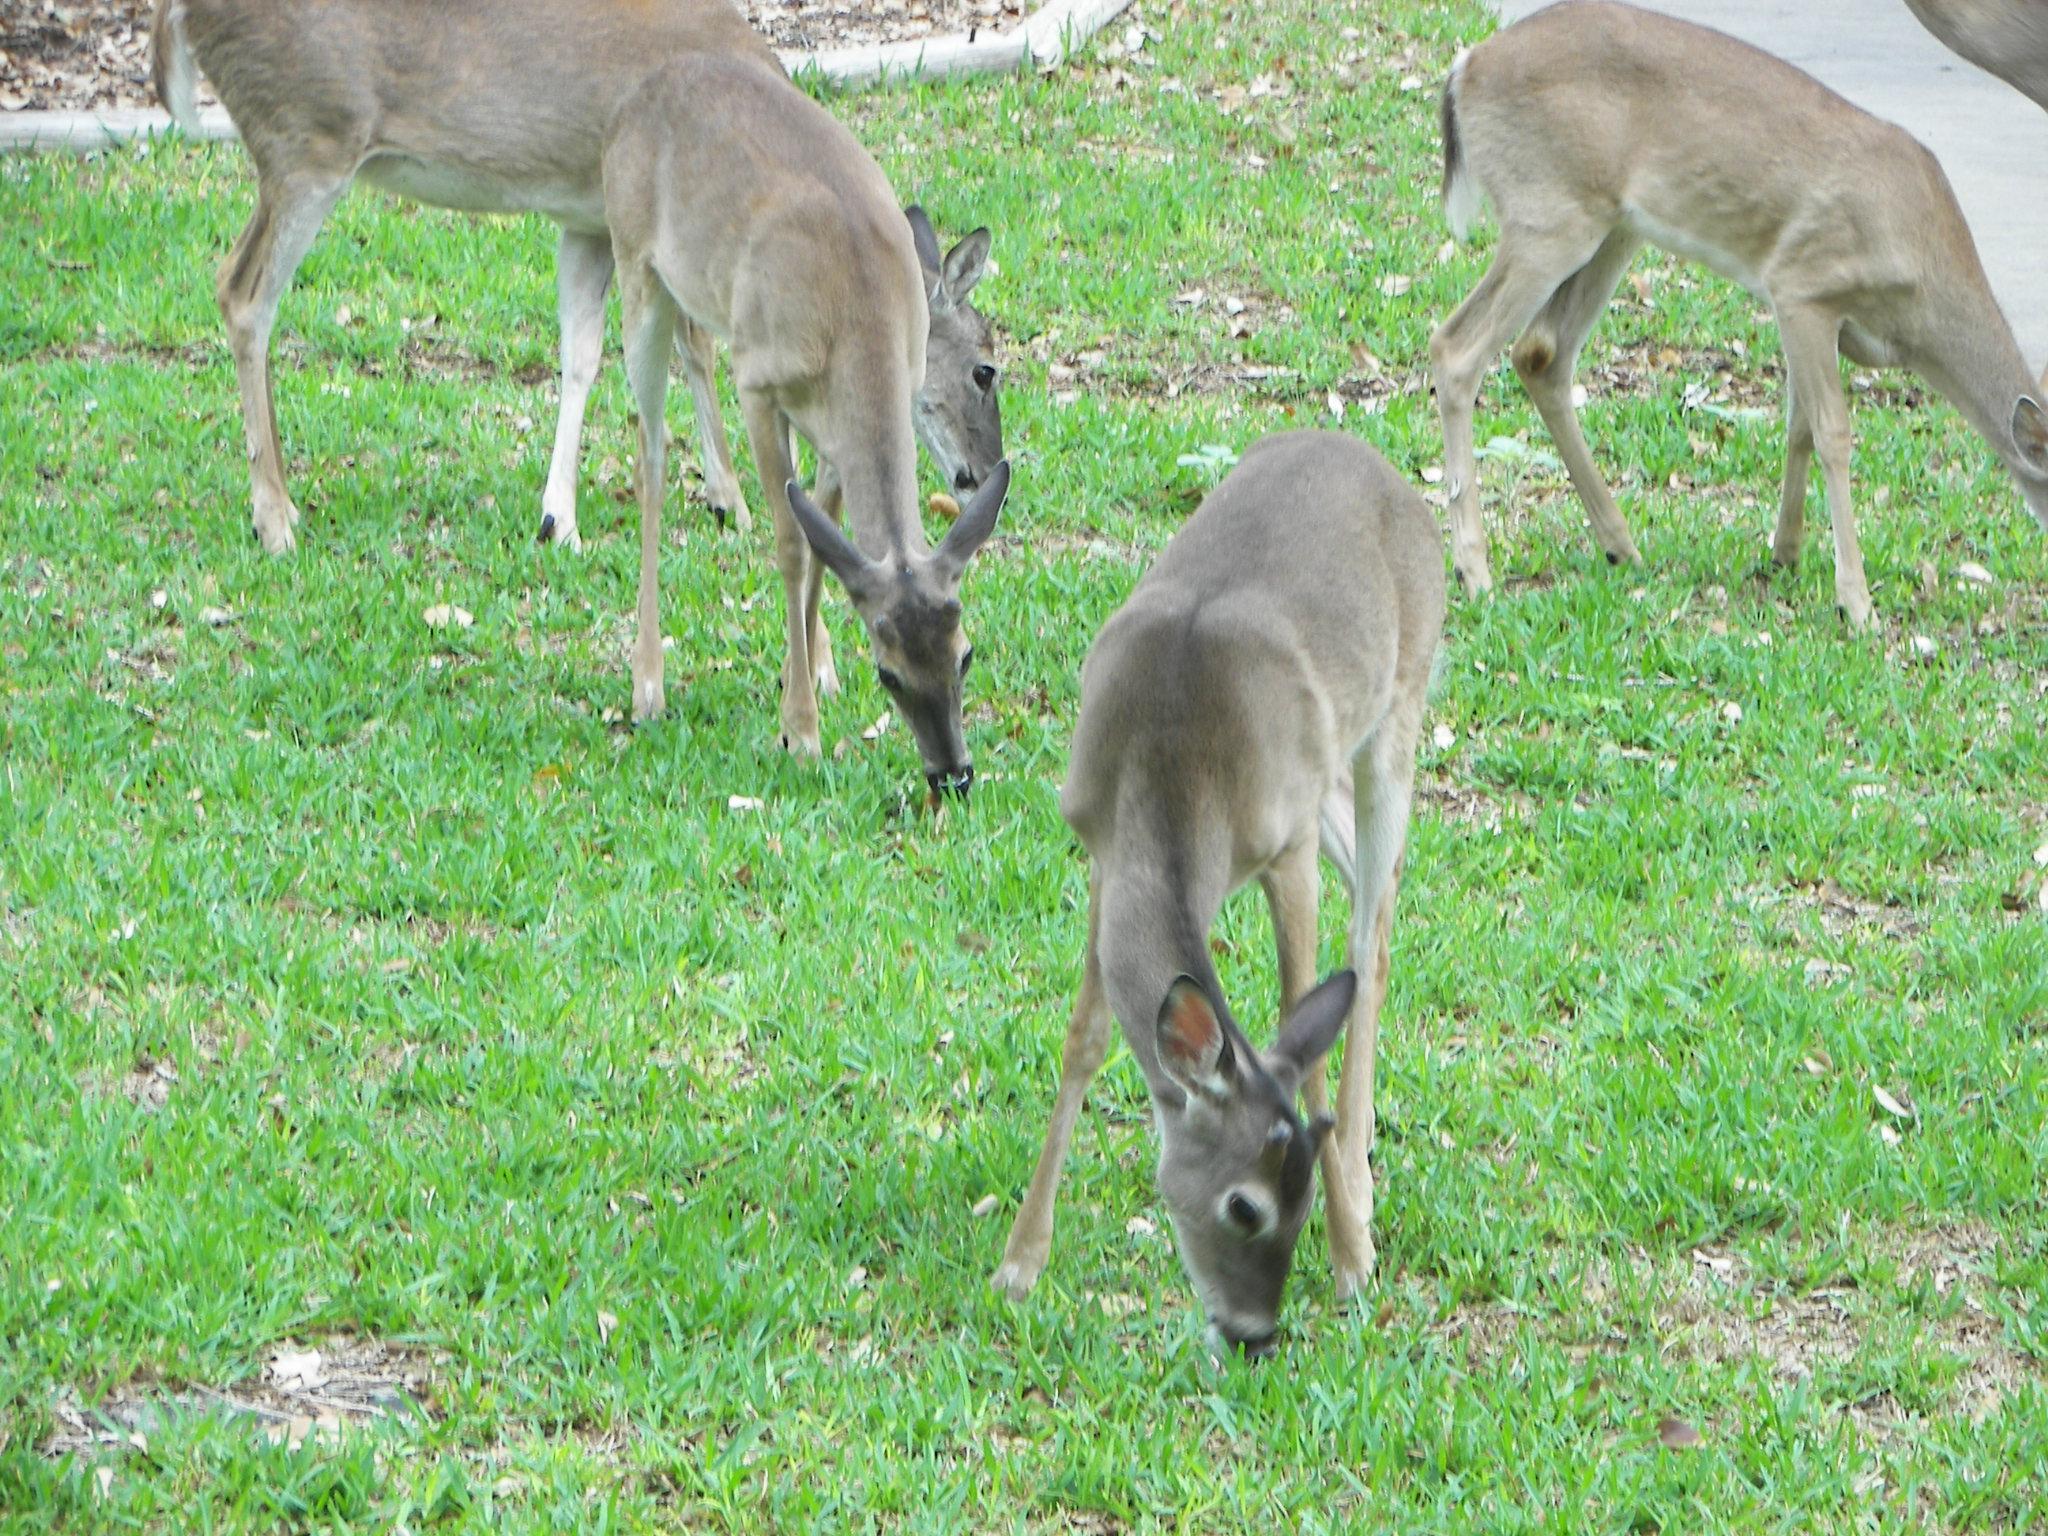 What do deer eat